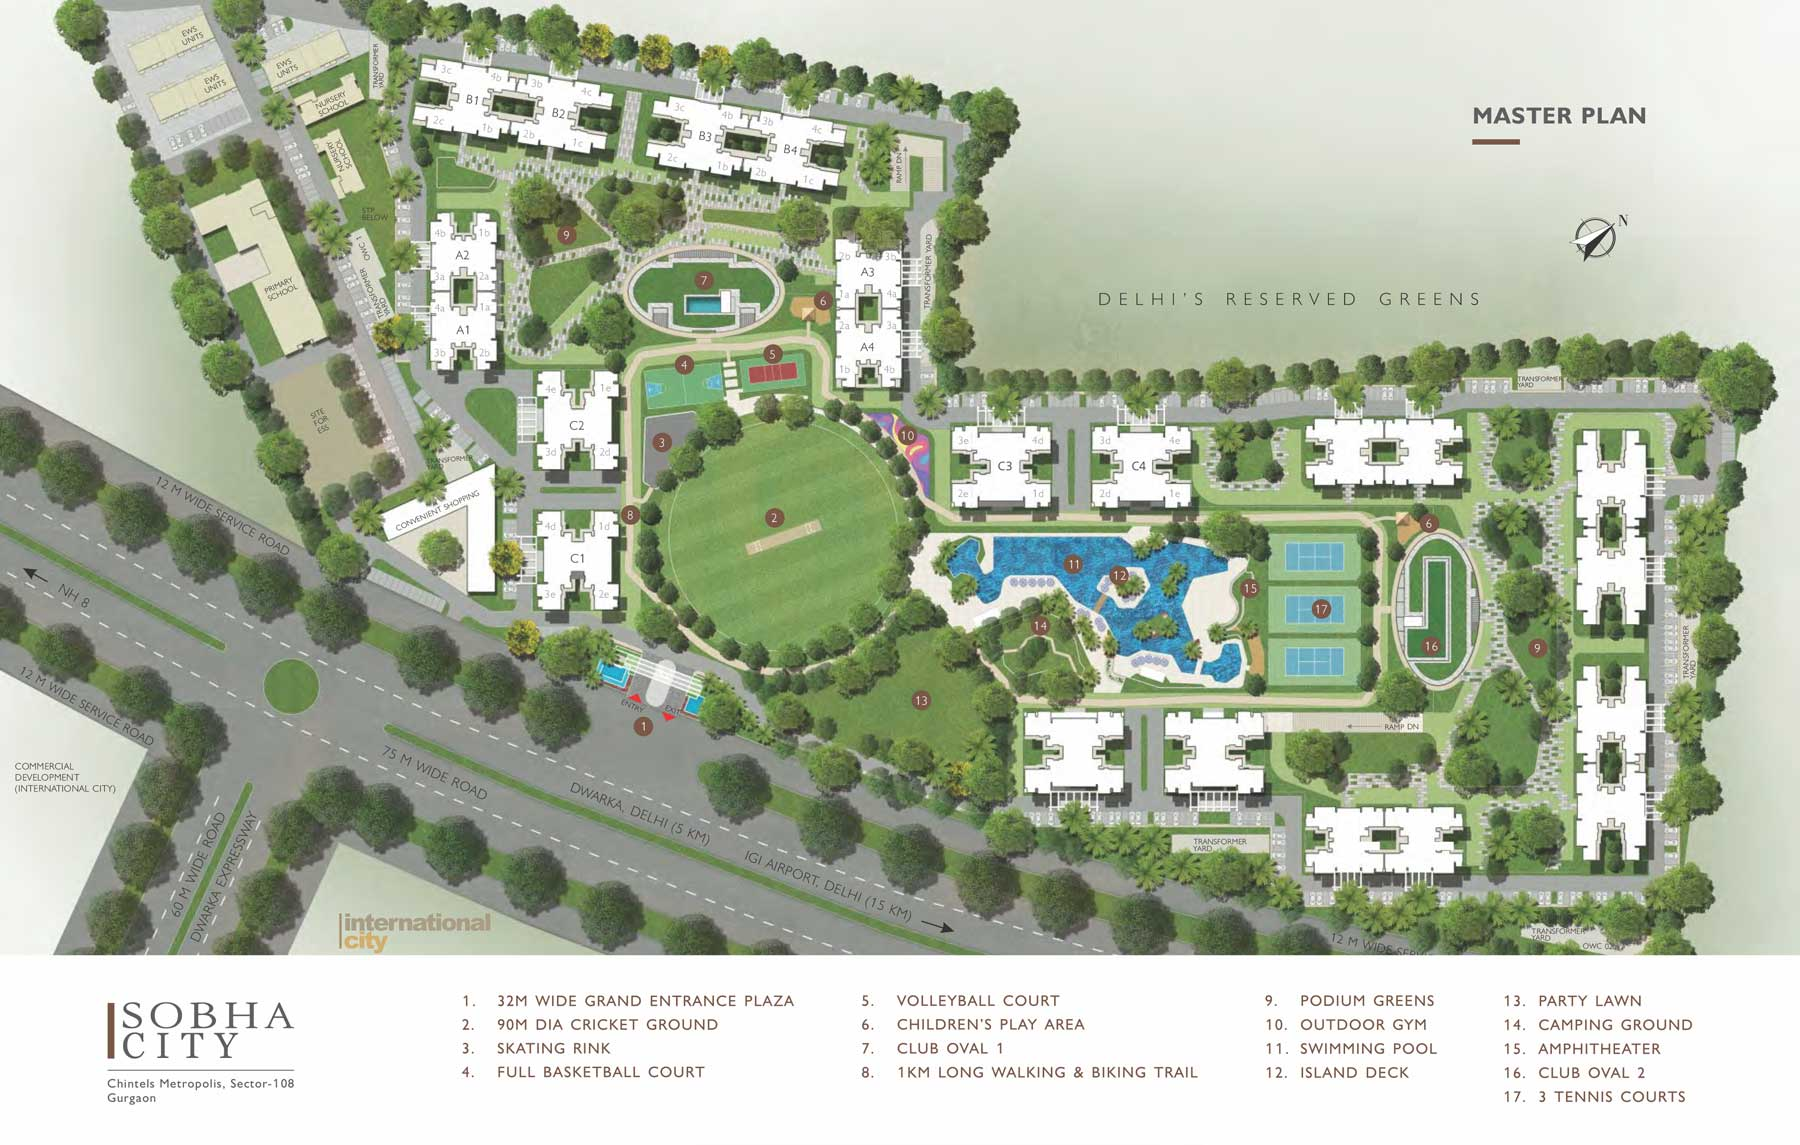 Sobha City Layout Plan